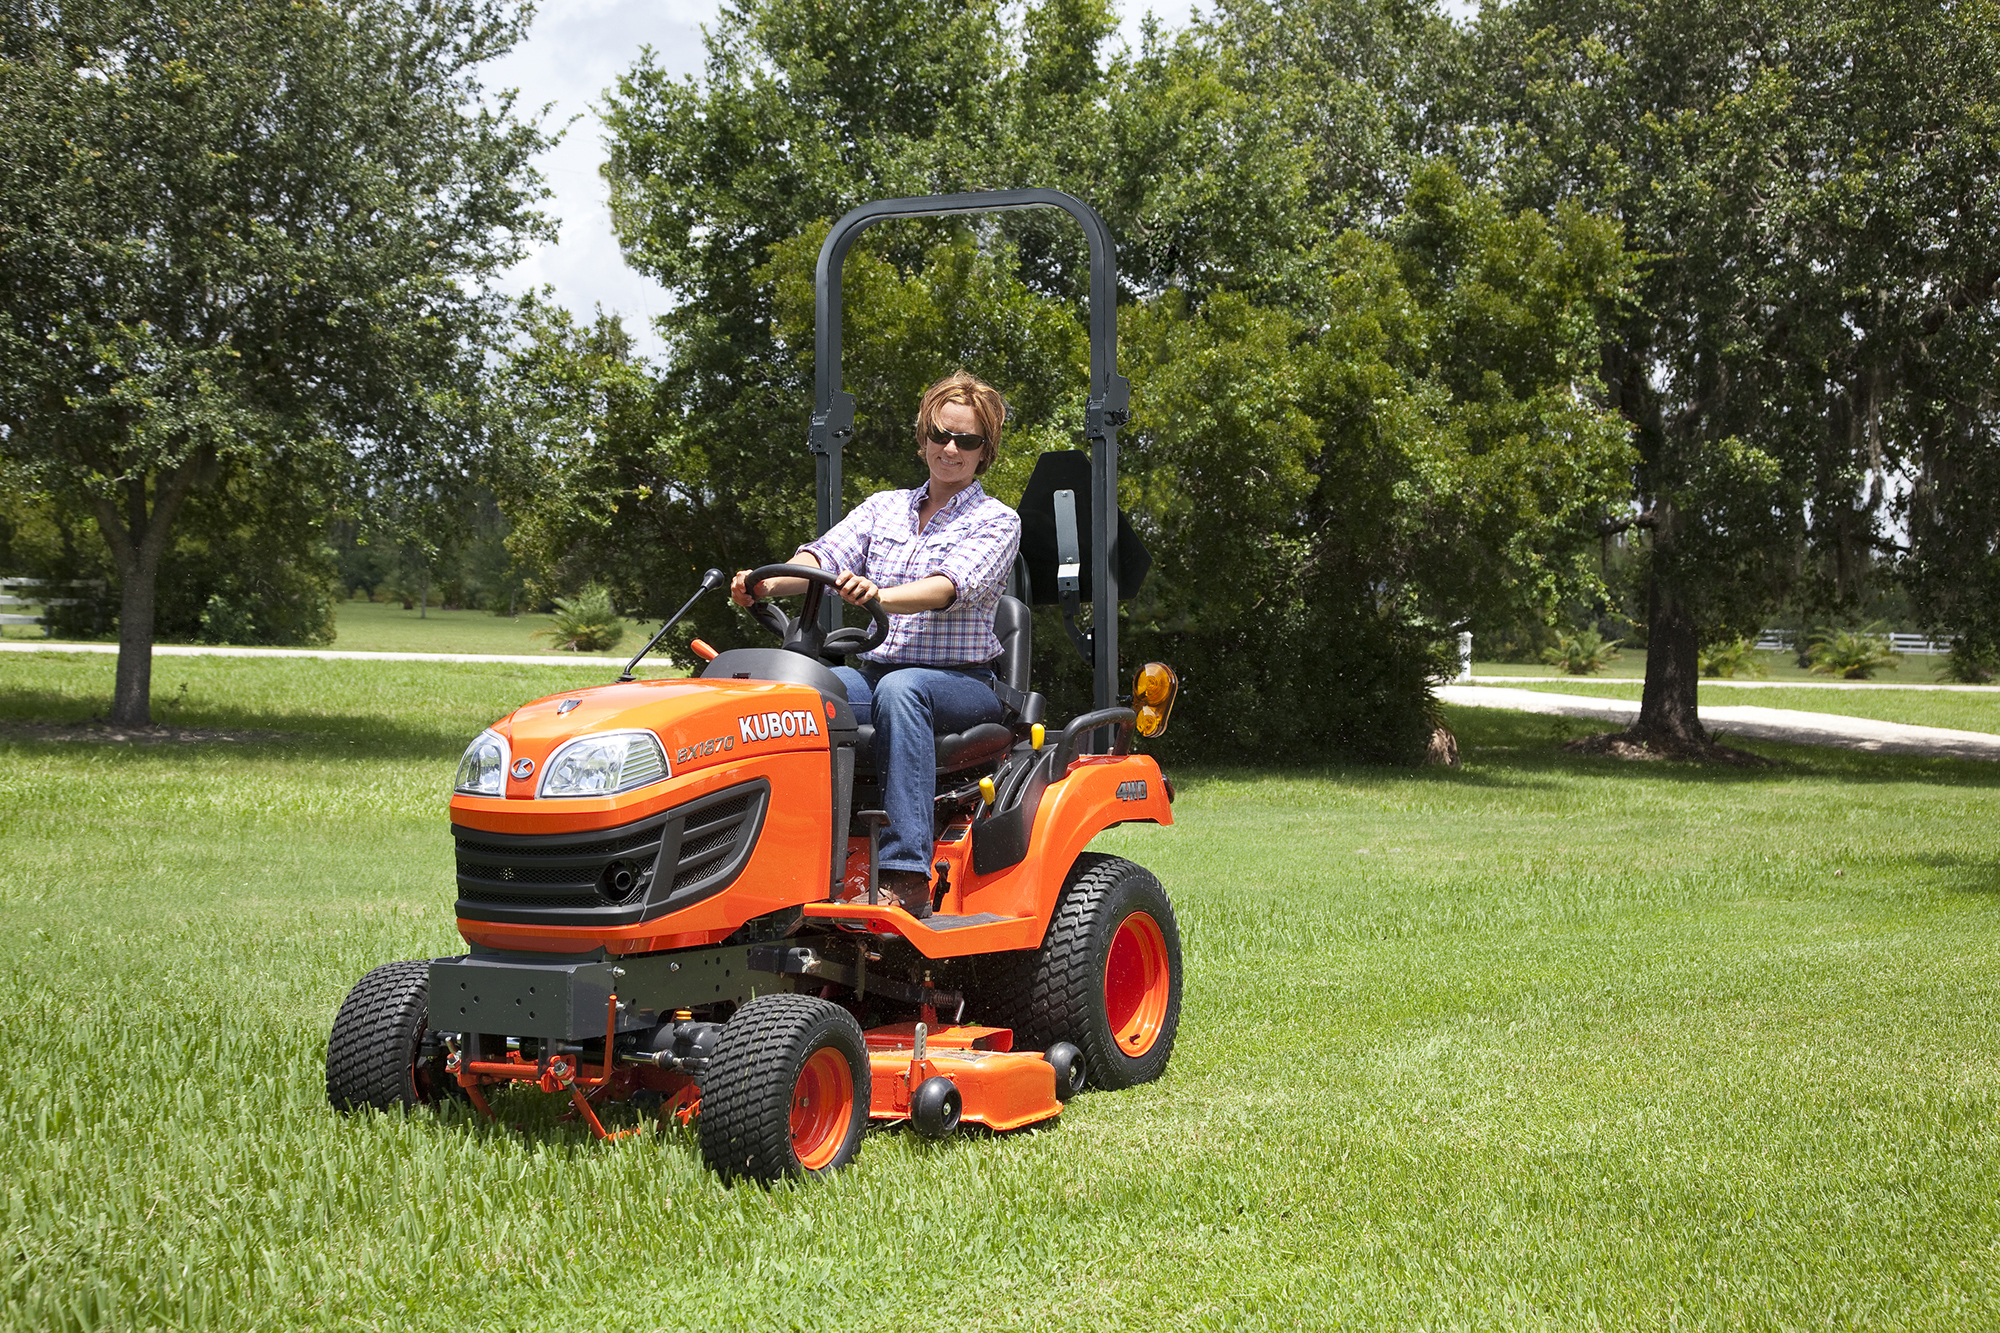 Bx Series Kubota Tractor Corporation Autos Post